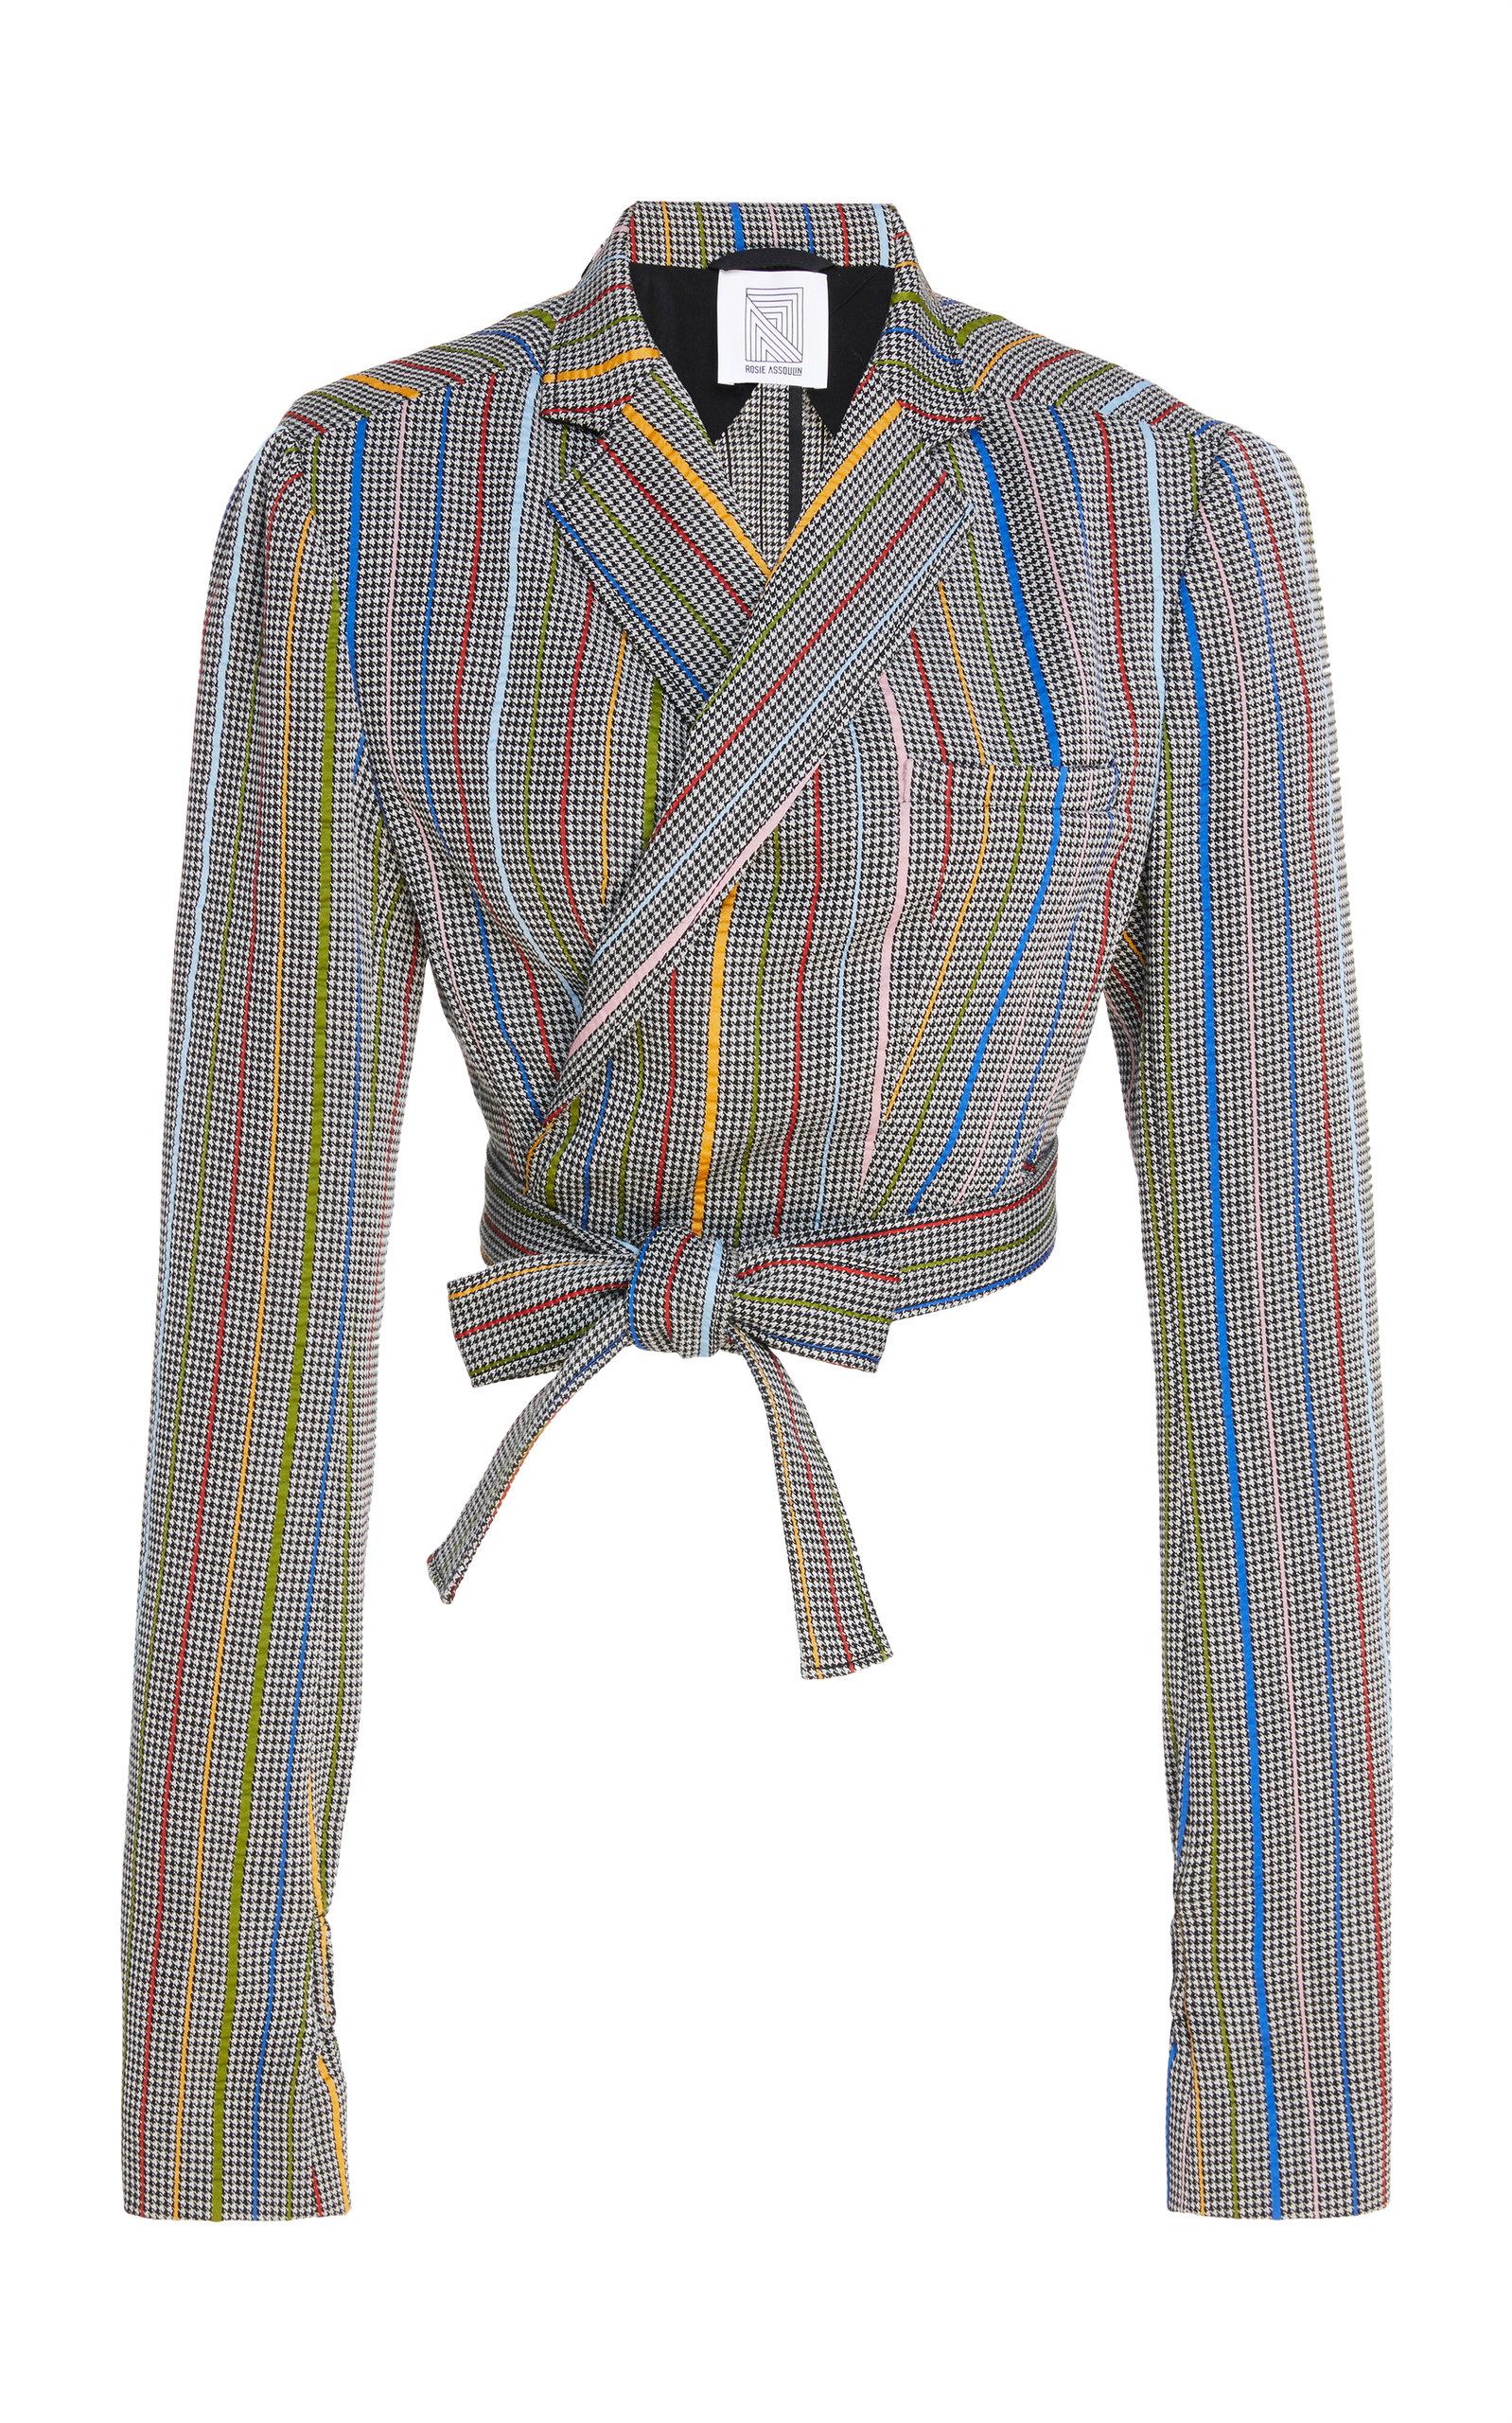 ROSIE ASSOULIN Cropped Wool And Silk-Blend Jacquard Wrap Blazer in Grey